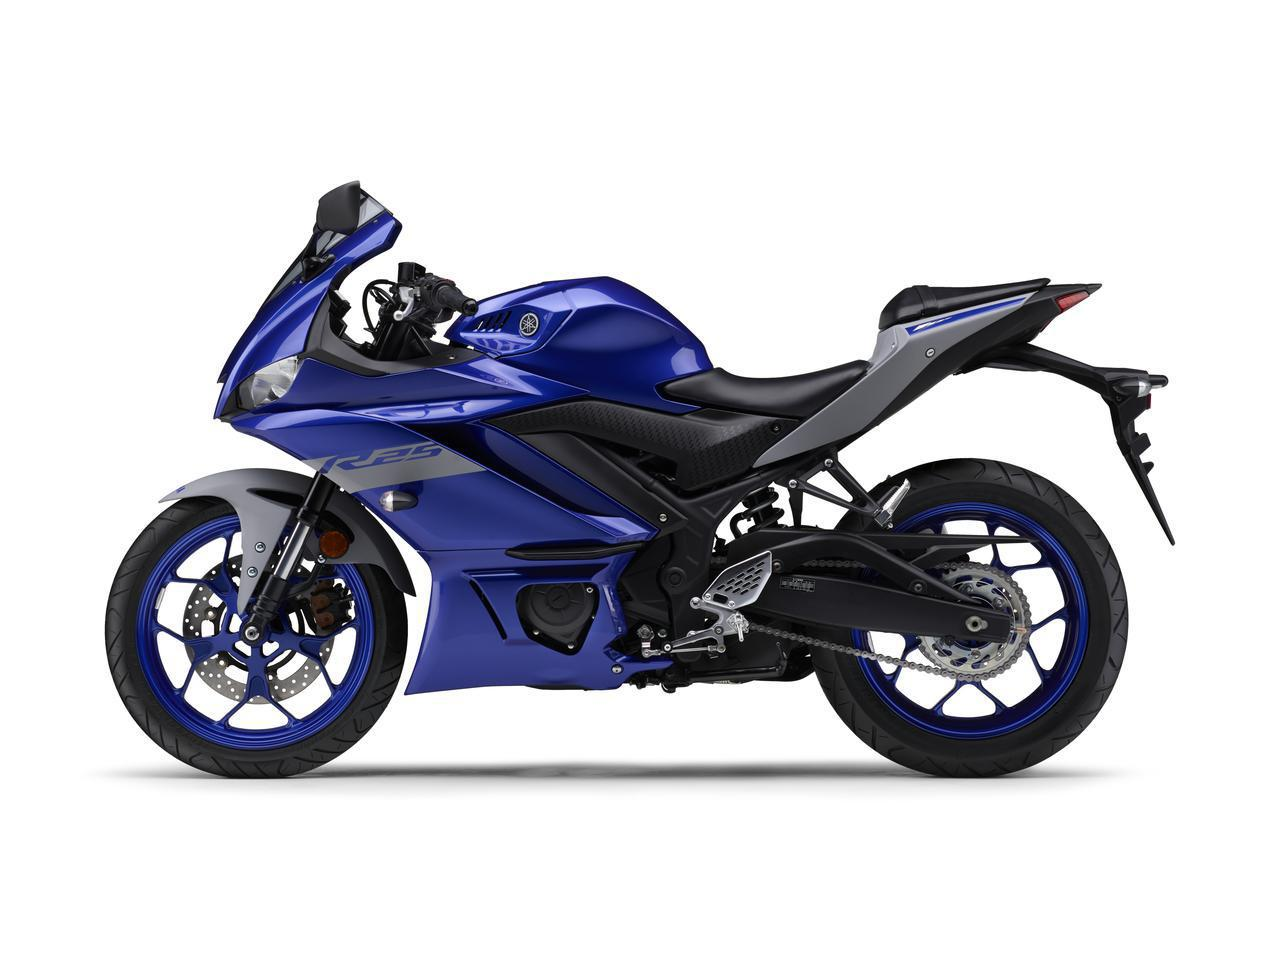 Images : 4番目の画像 - ヤマハ YZF-R25の写真をまとめて見る! - LAWRENCE - Motorcycle x Cars + α = Your Life.